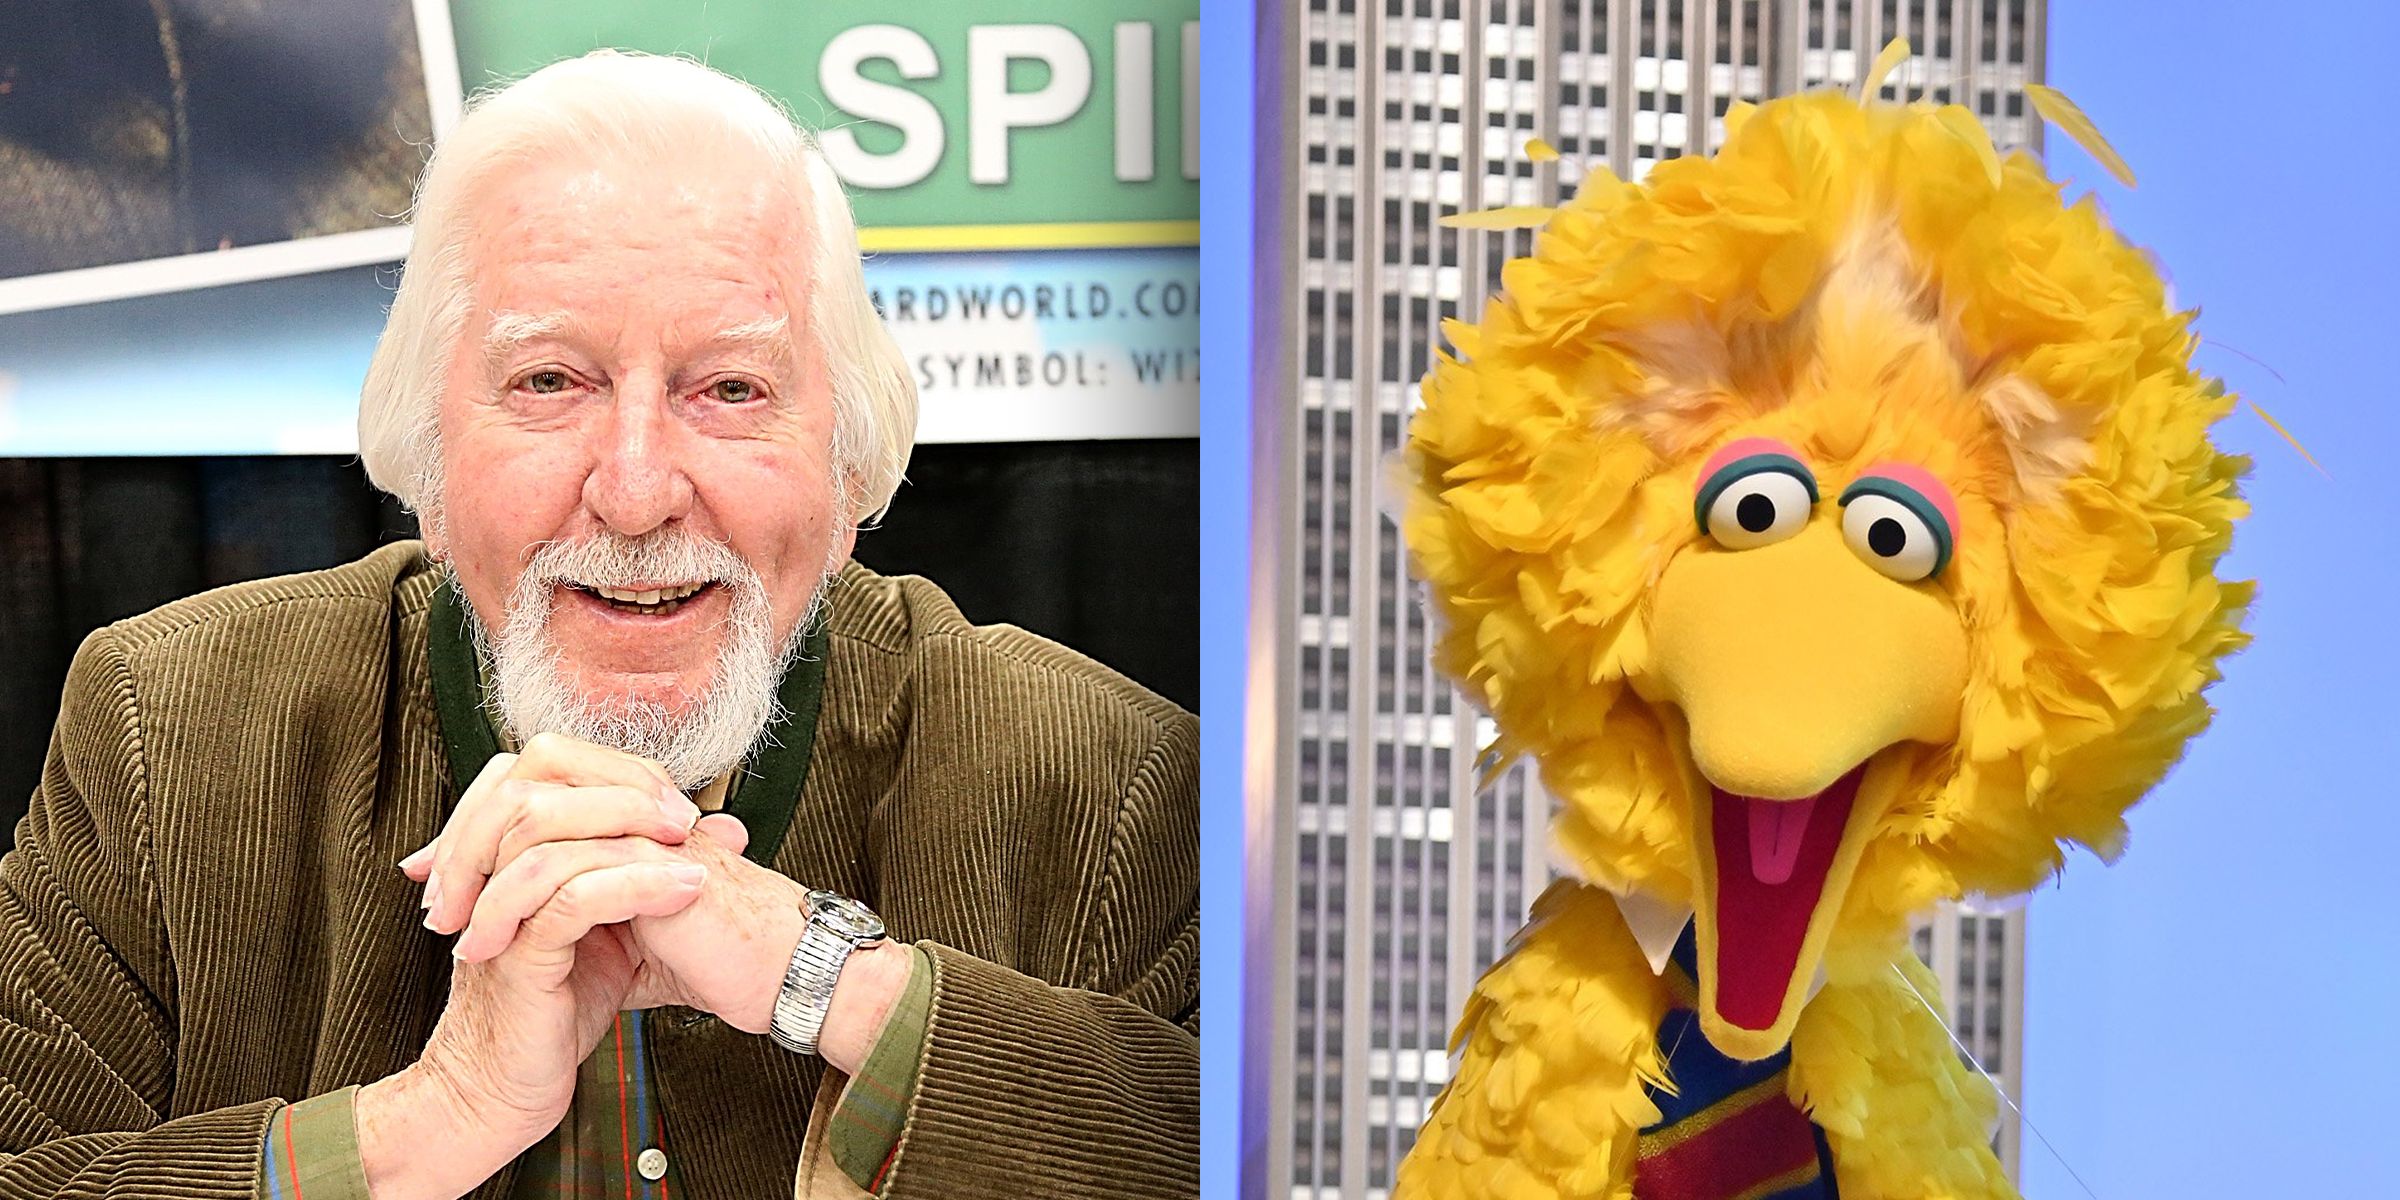 Big Bird Actor Caroll Spinney Had Been In Talks To Join